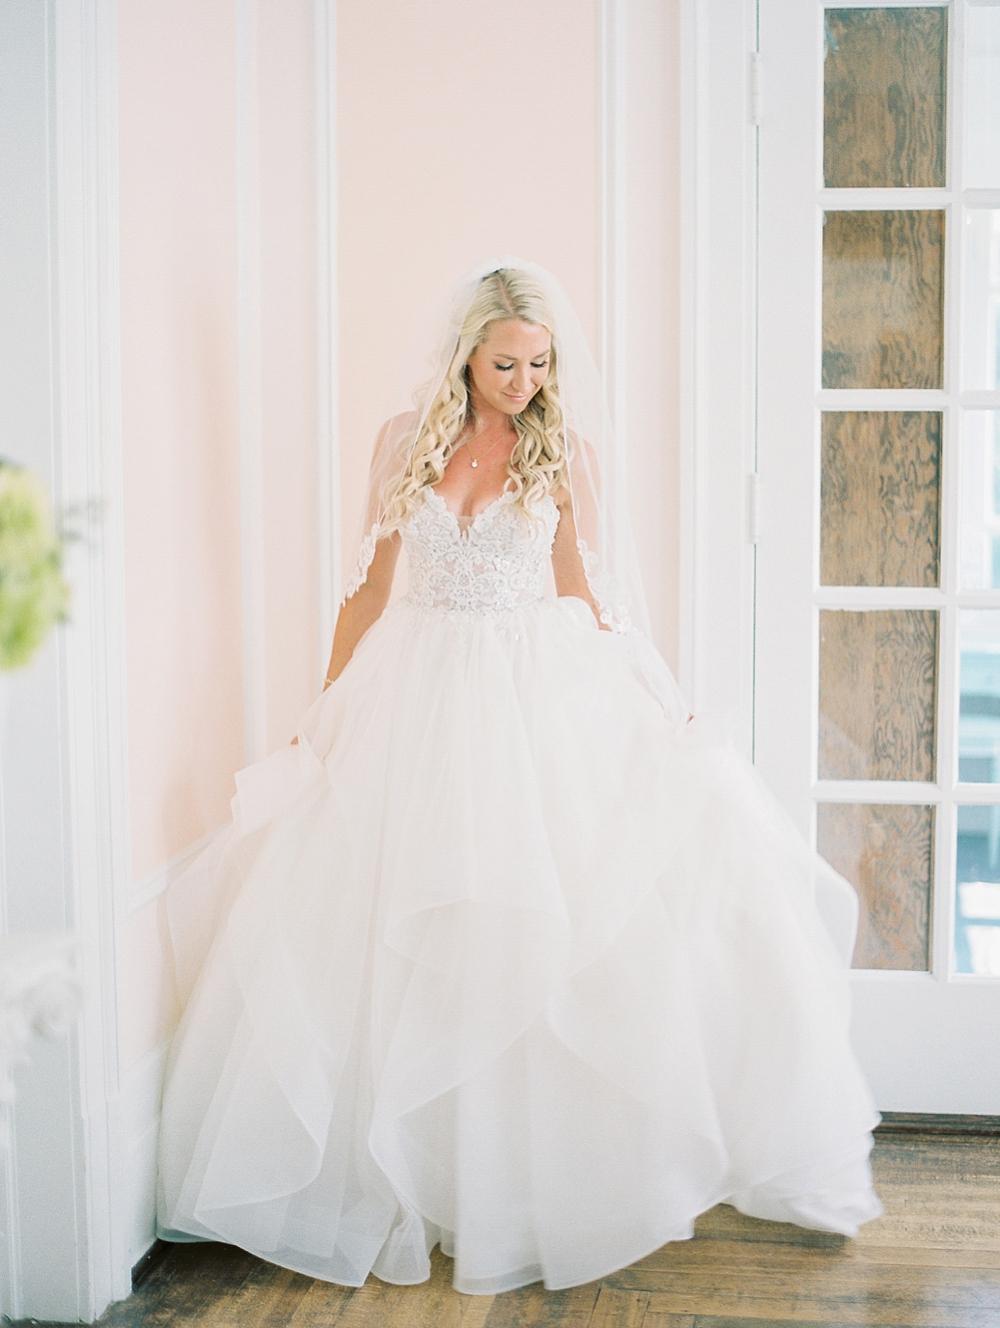 kristin-la-voie-photography-lehmann-mansion-wedding-photographer-147